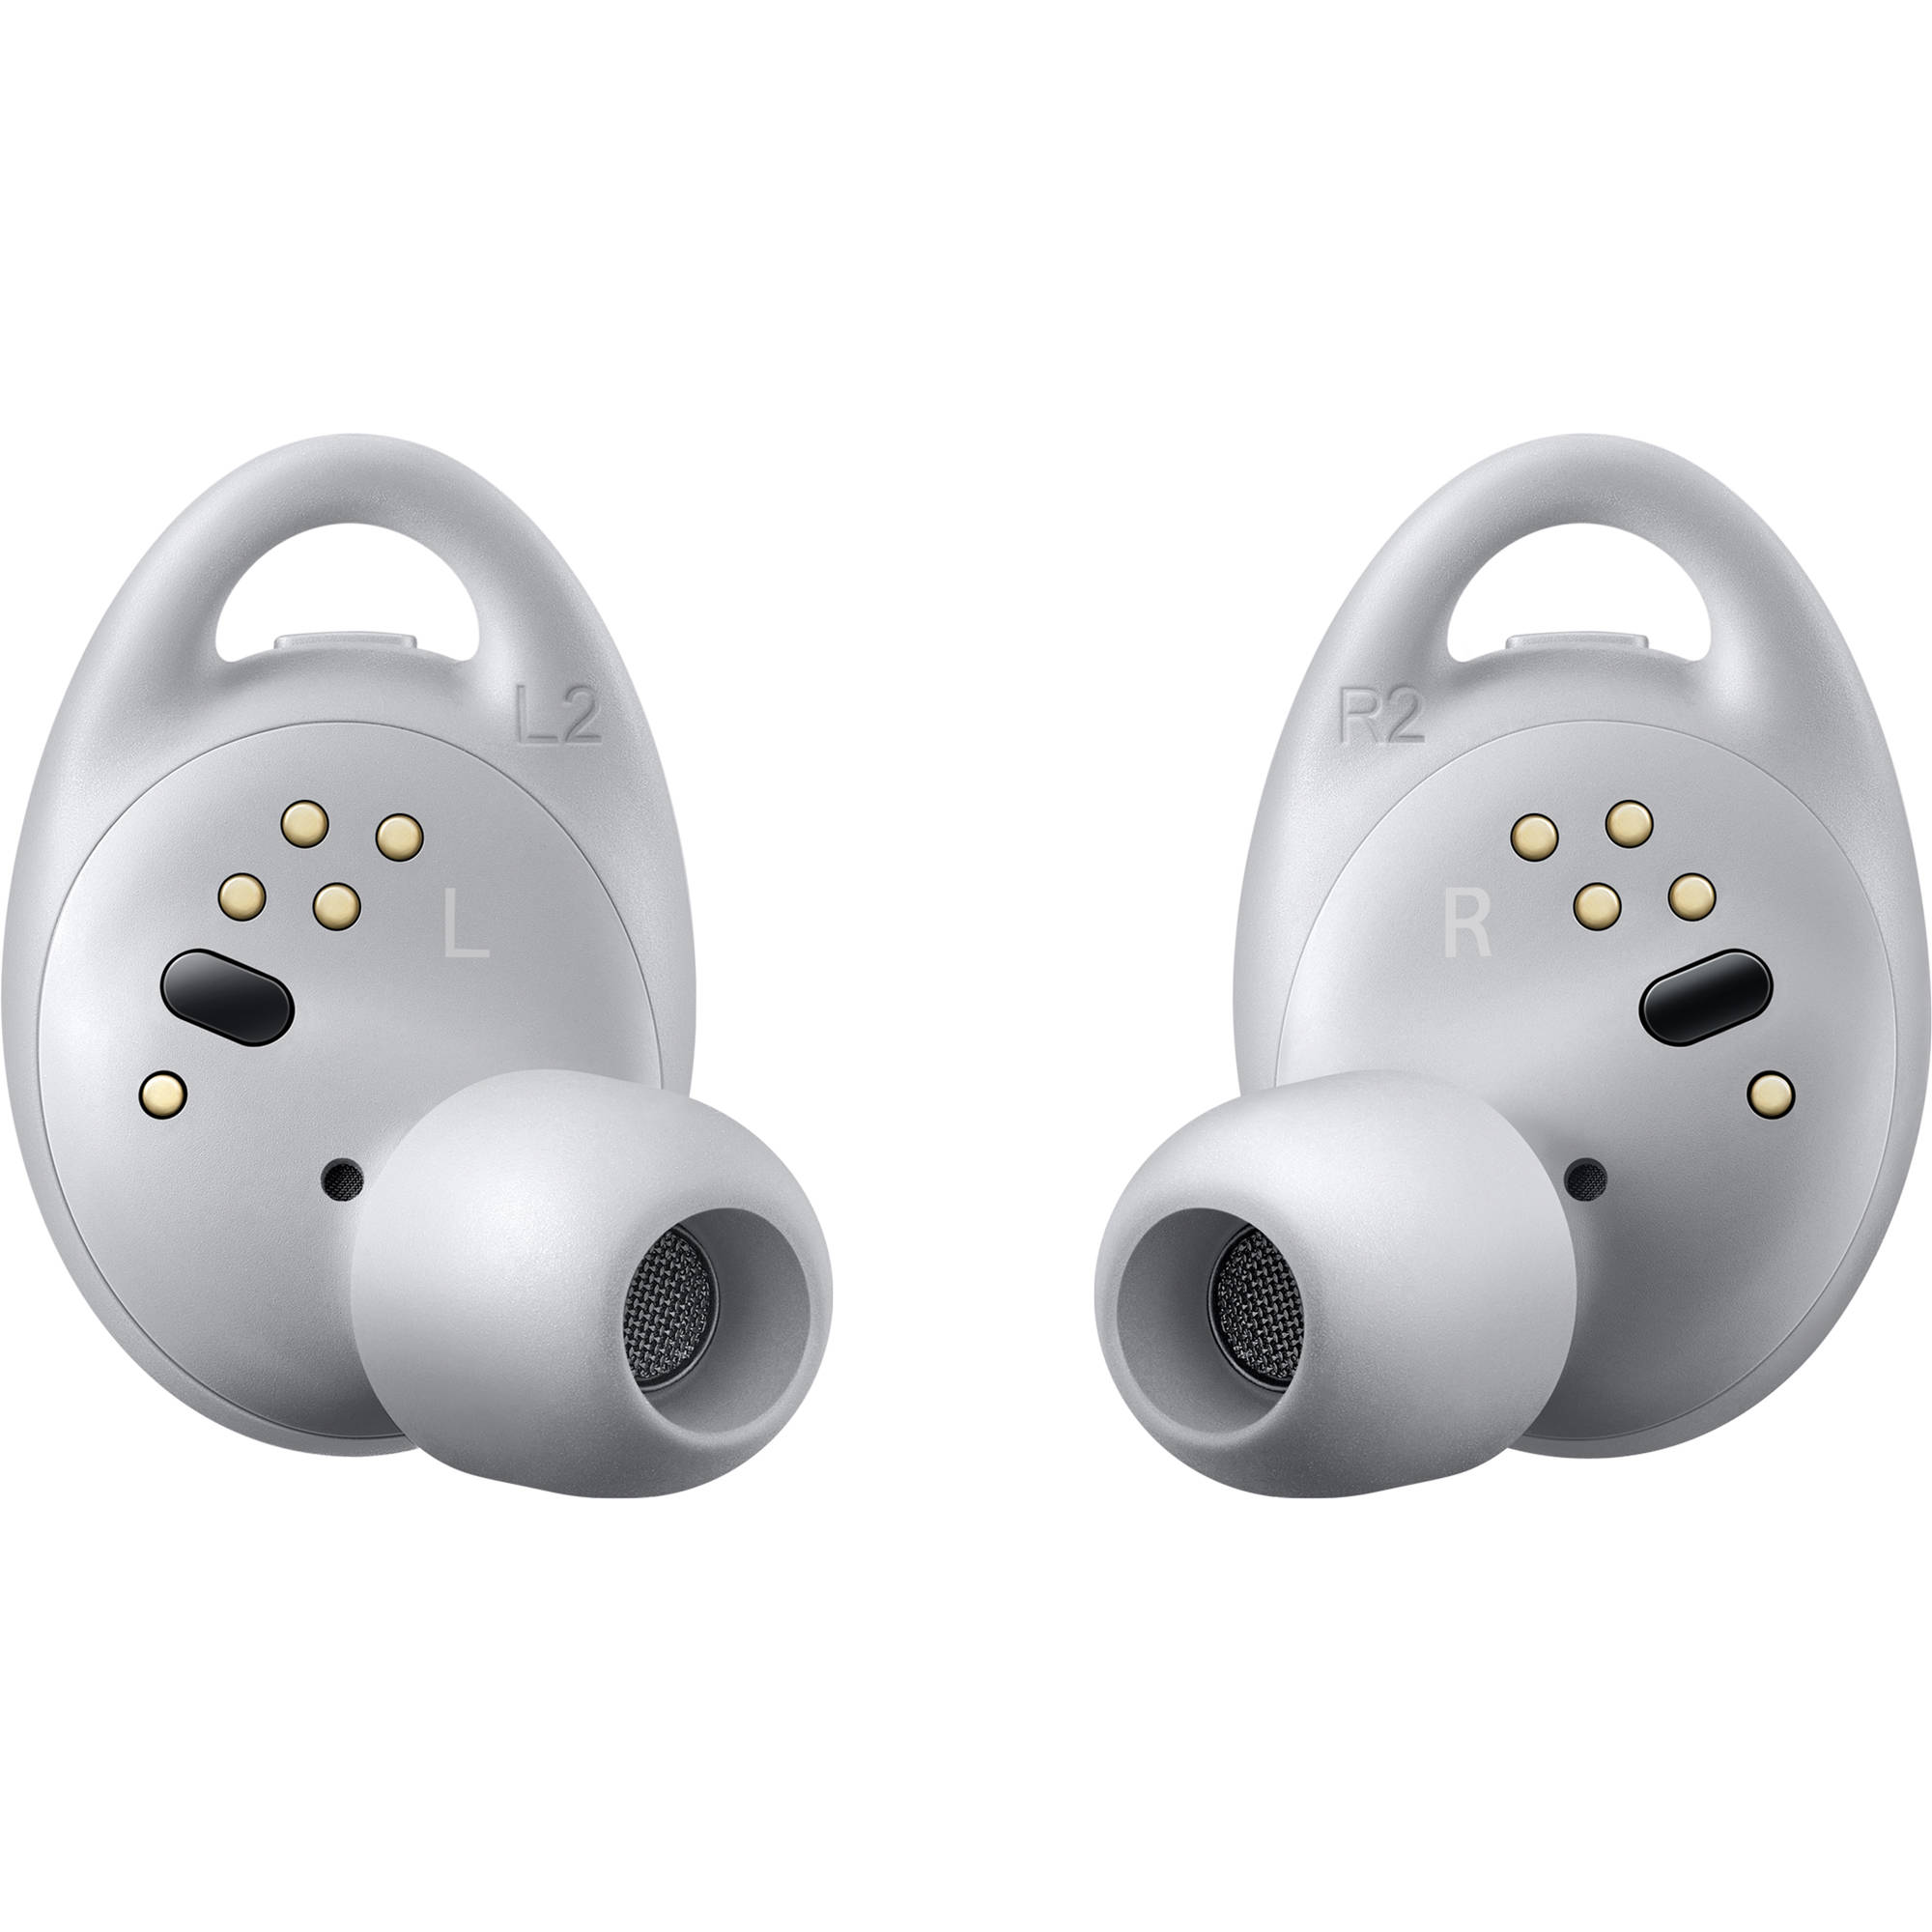 000b33dac4b Samsung Gear IconX Wireless Earbuds SM-R140NZWAXAR B&H Photo